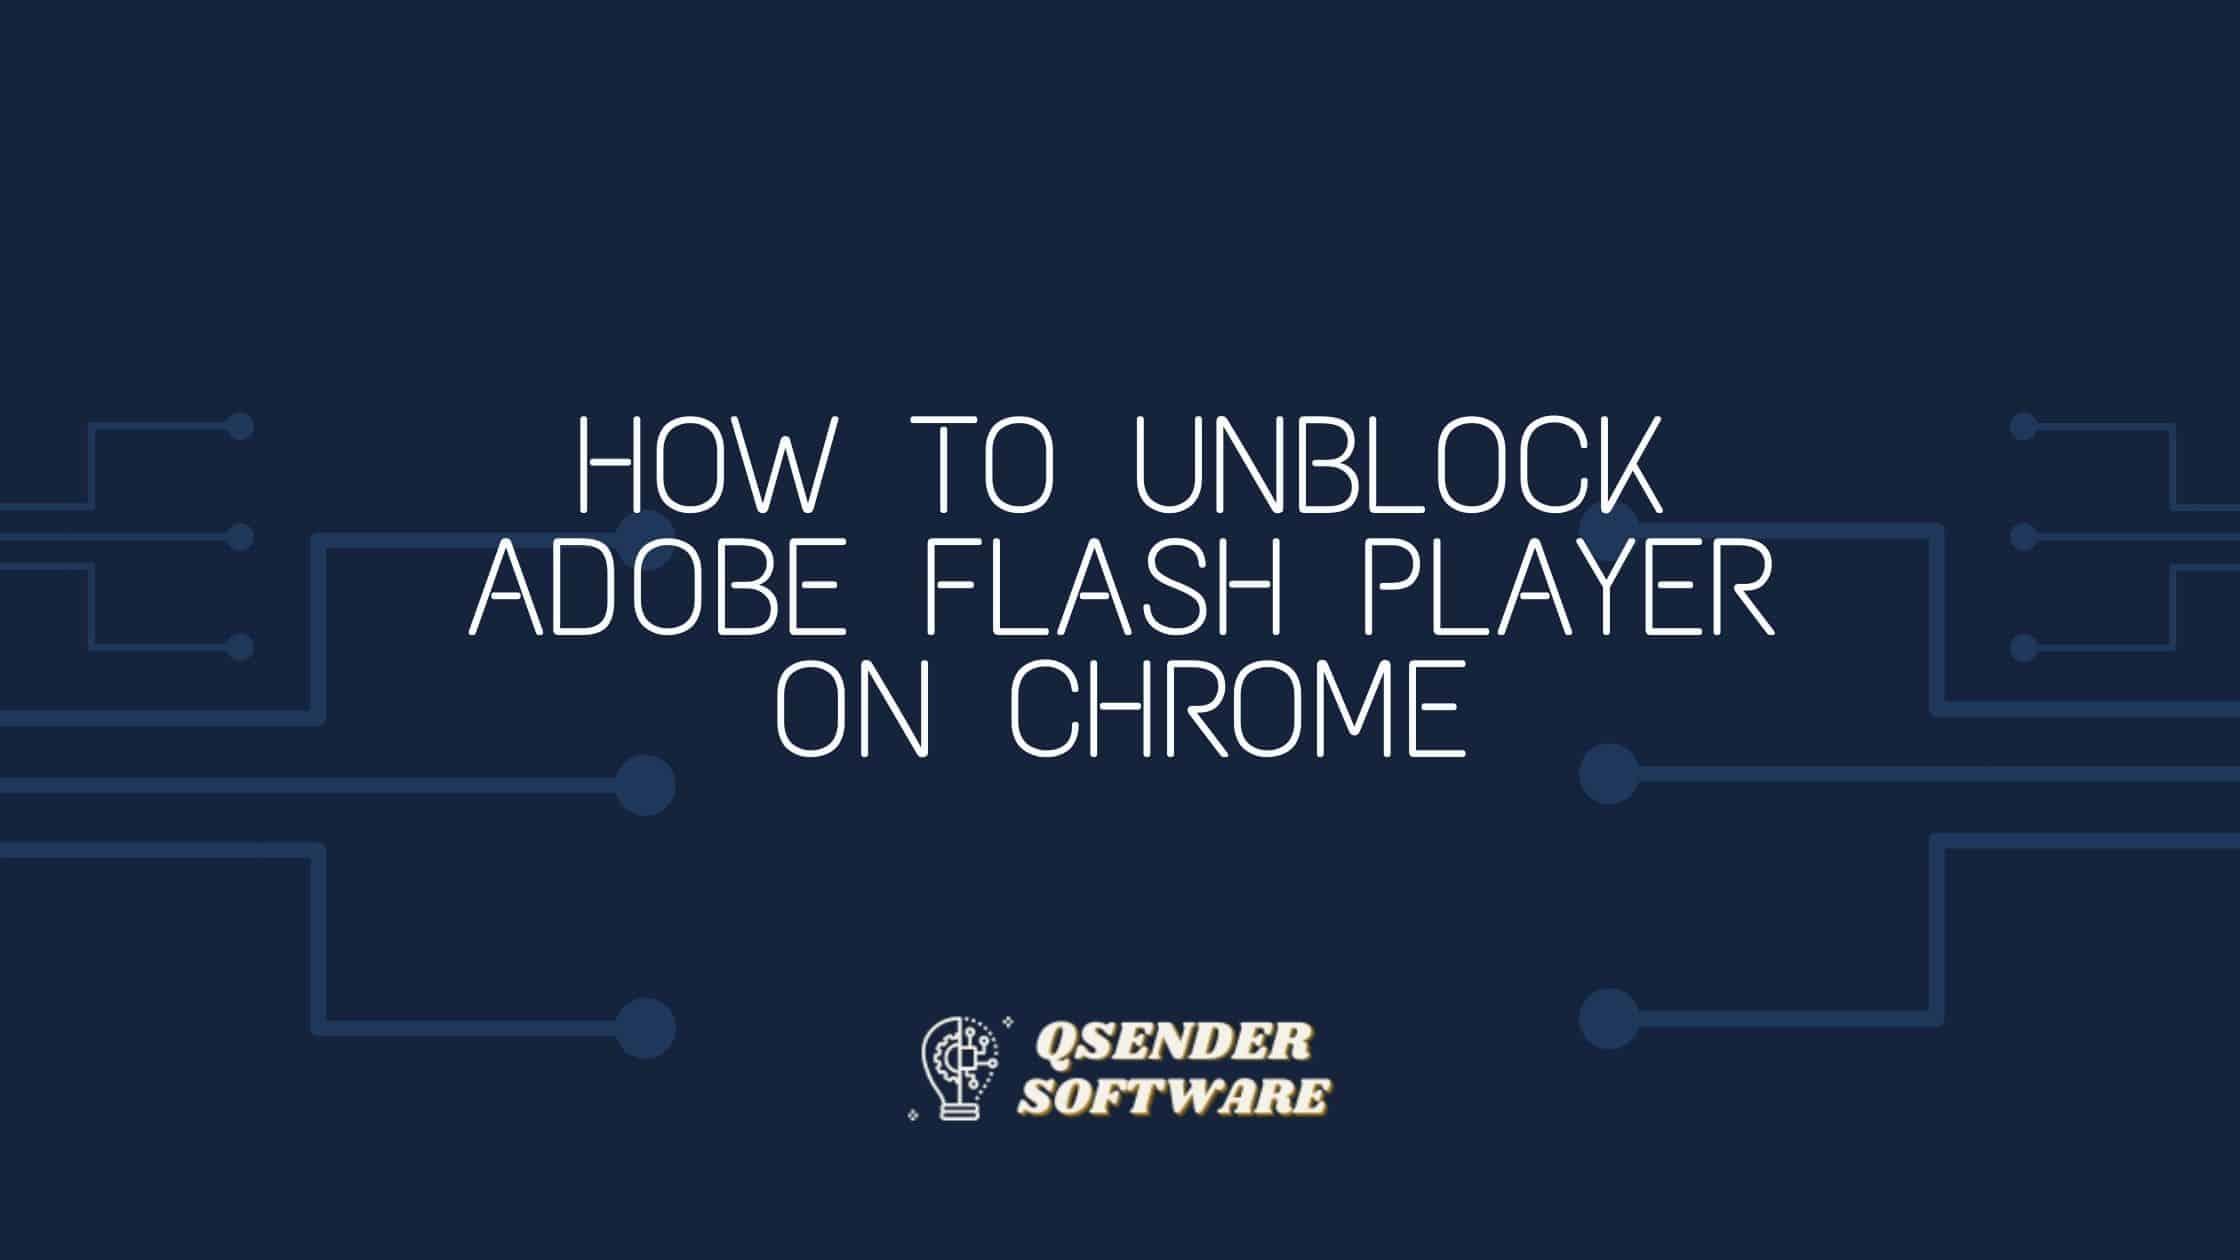 Unblock Adobe Flash Player On Chrome